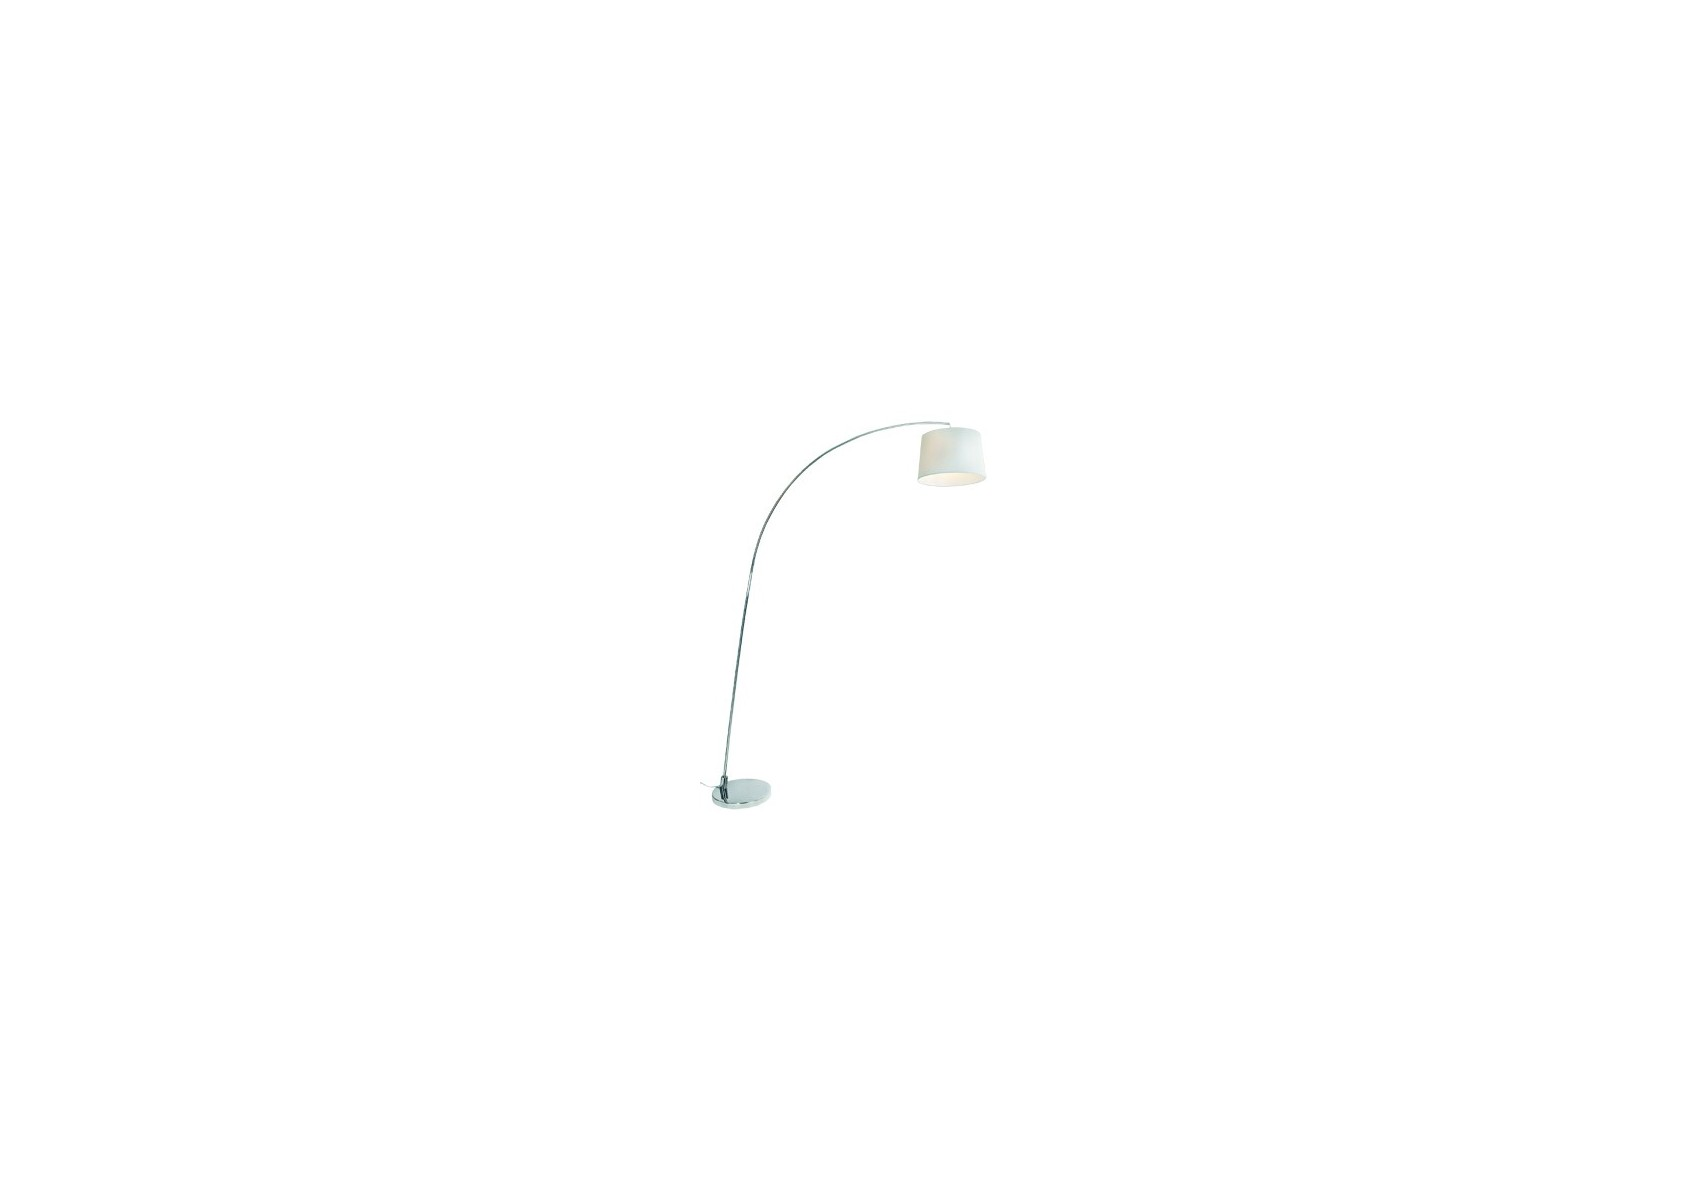 Lampadaire design arc ls de chez aluminor avec abat jour blanc - Lampadaire arc design ...